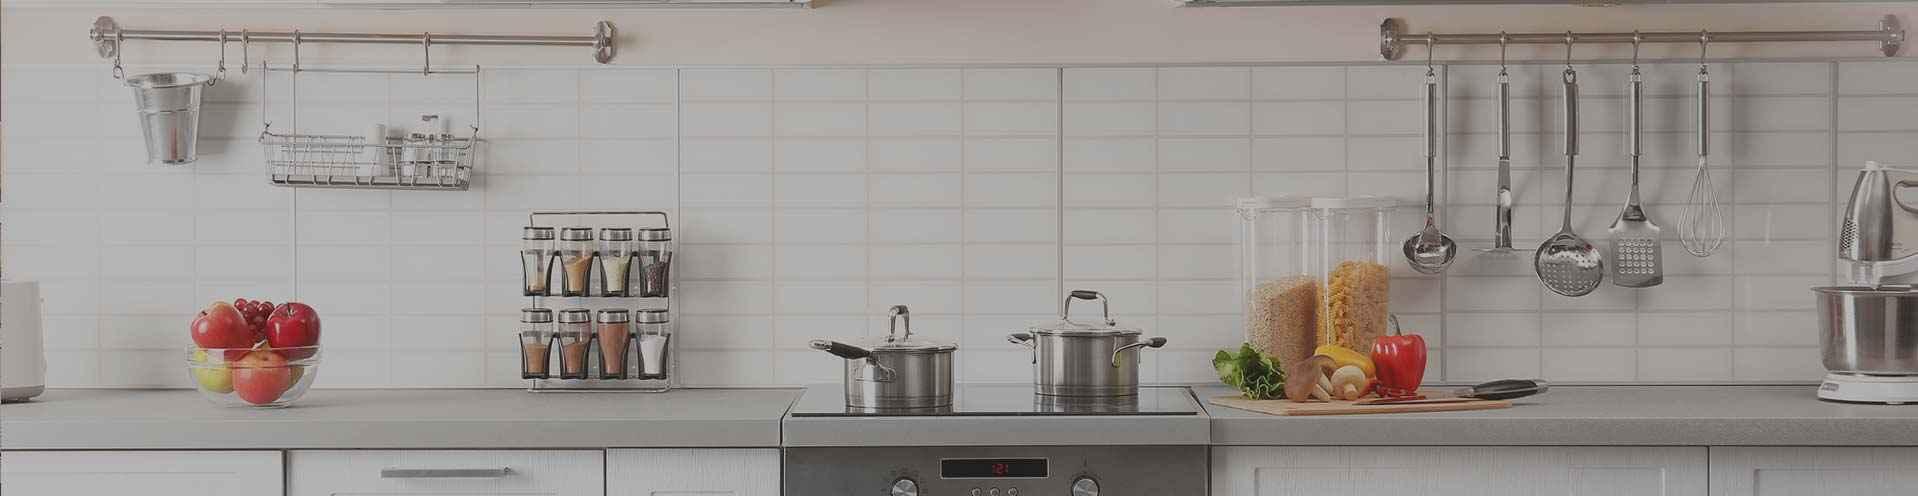 The 10 Best Kitchen Renovators In Bendigo Vic Oneflare